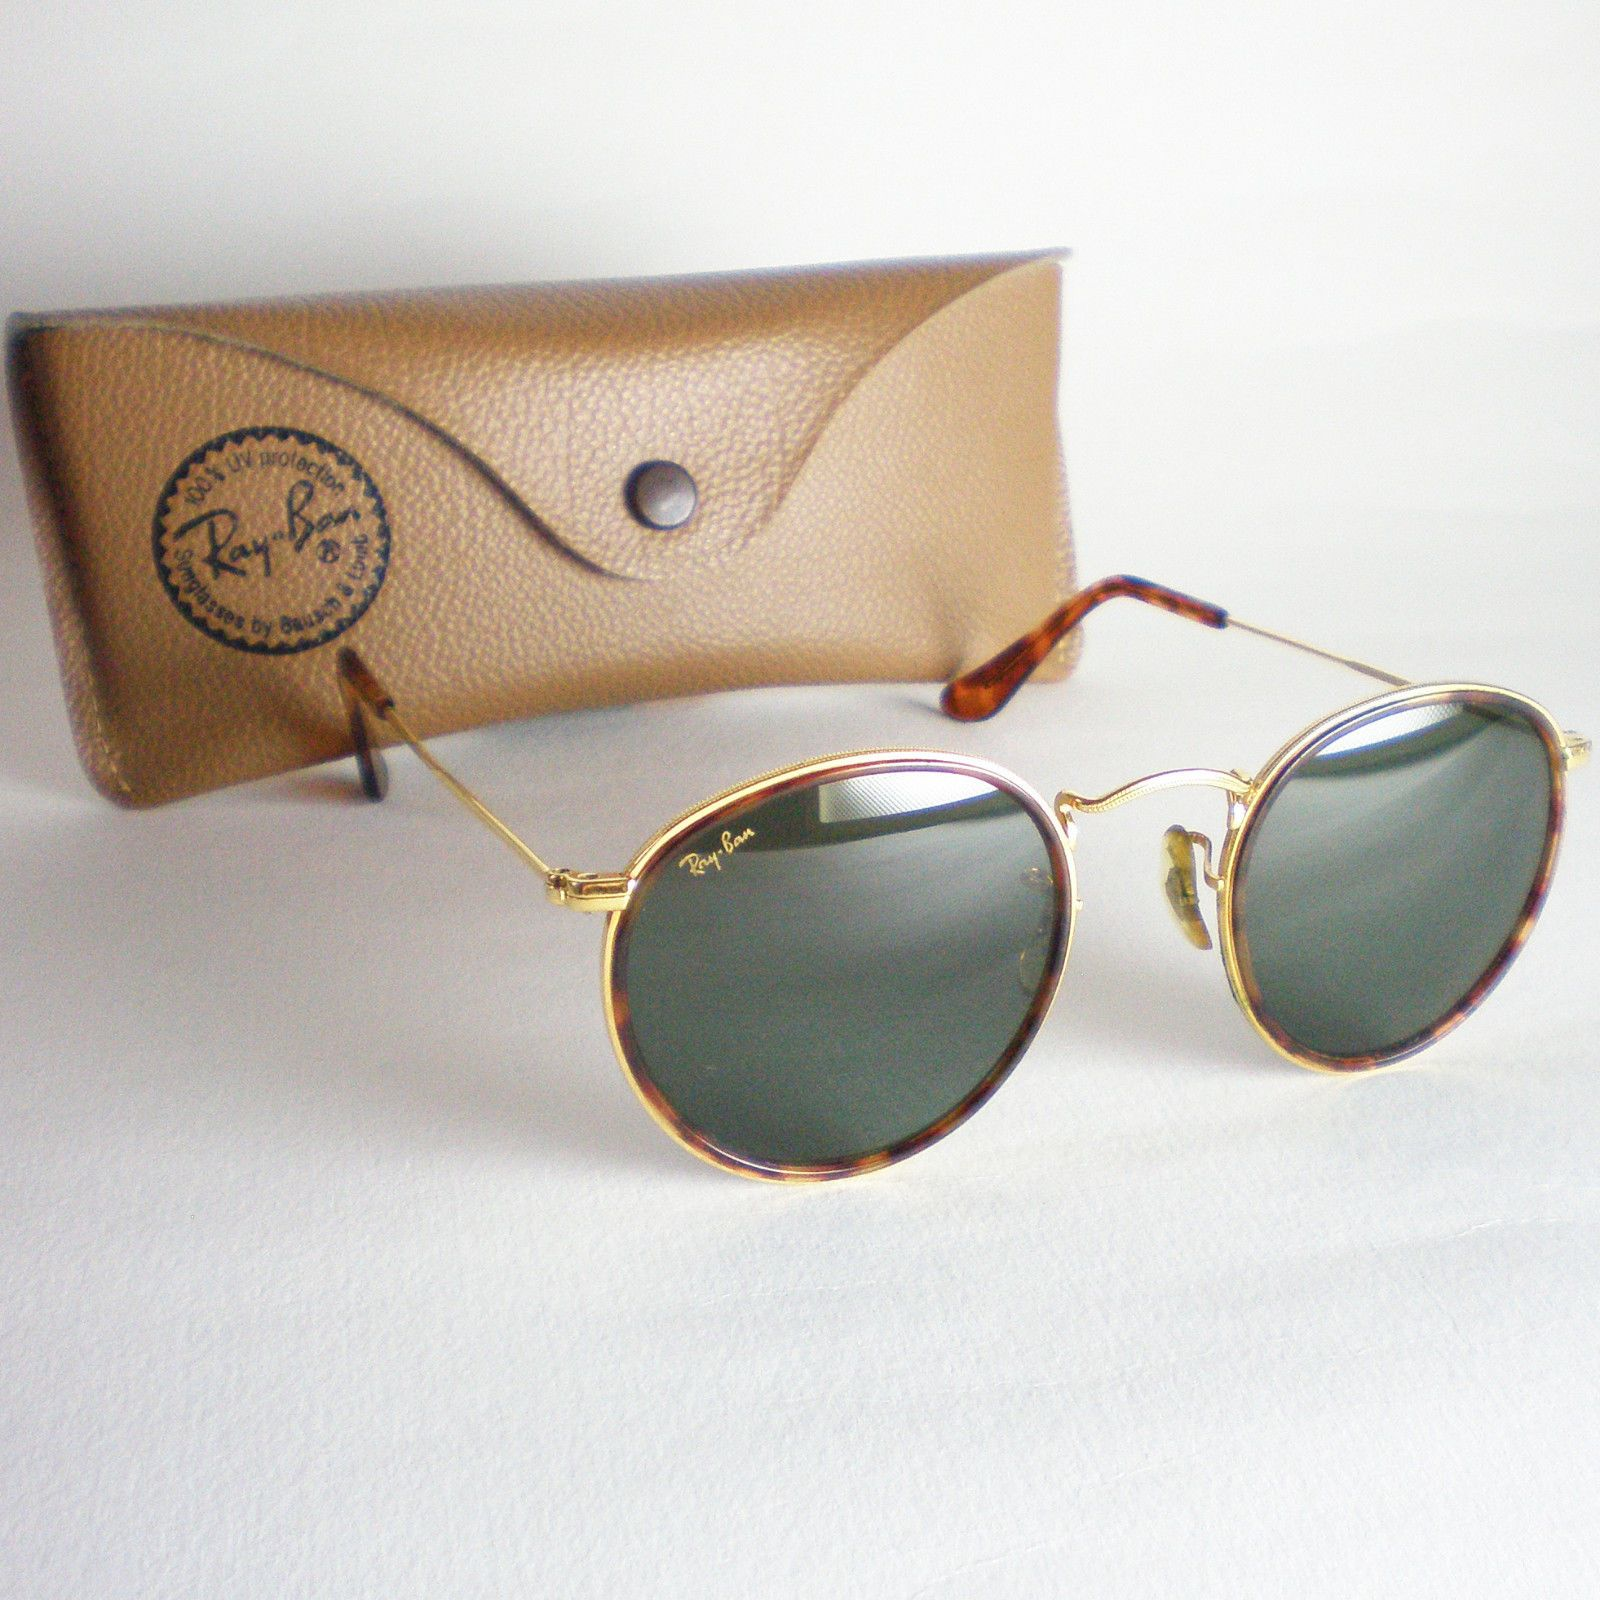 750a7bbe7b Vintage Ray Ban B L USA ROUND Sunglasses john lennon gold gatsby tortoise  brown